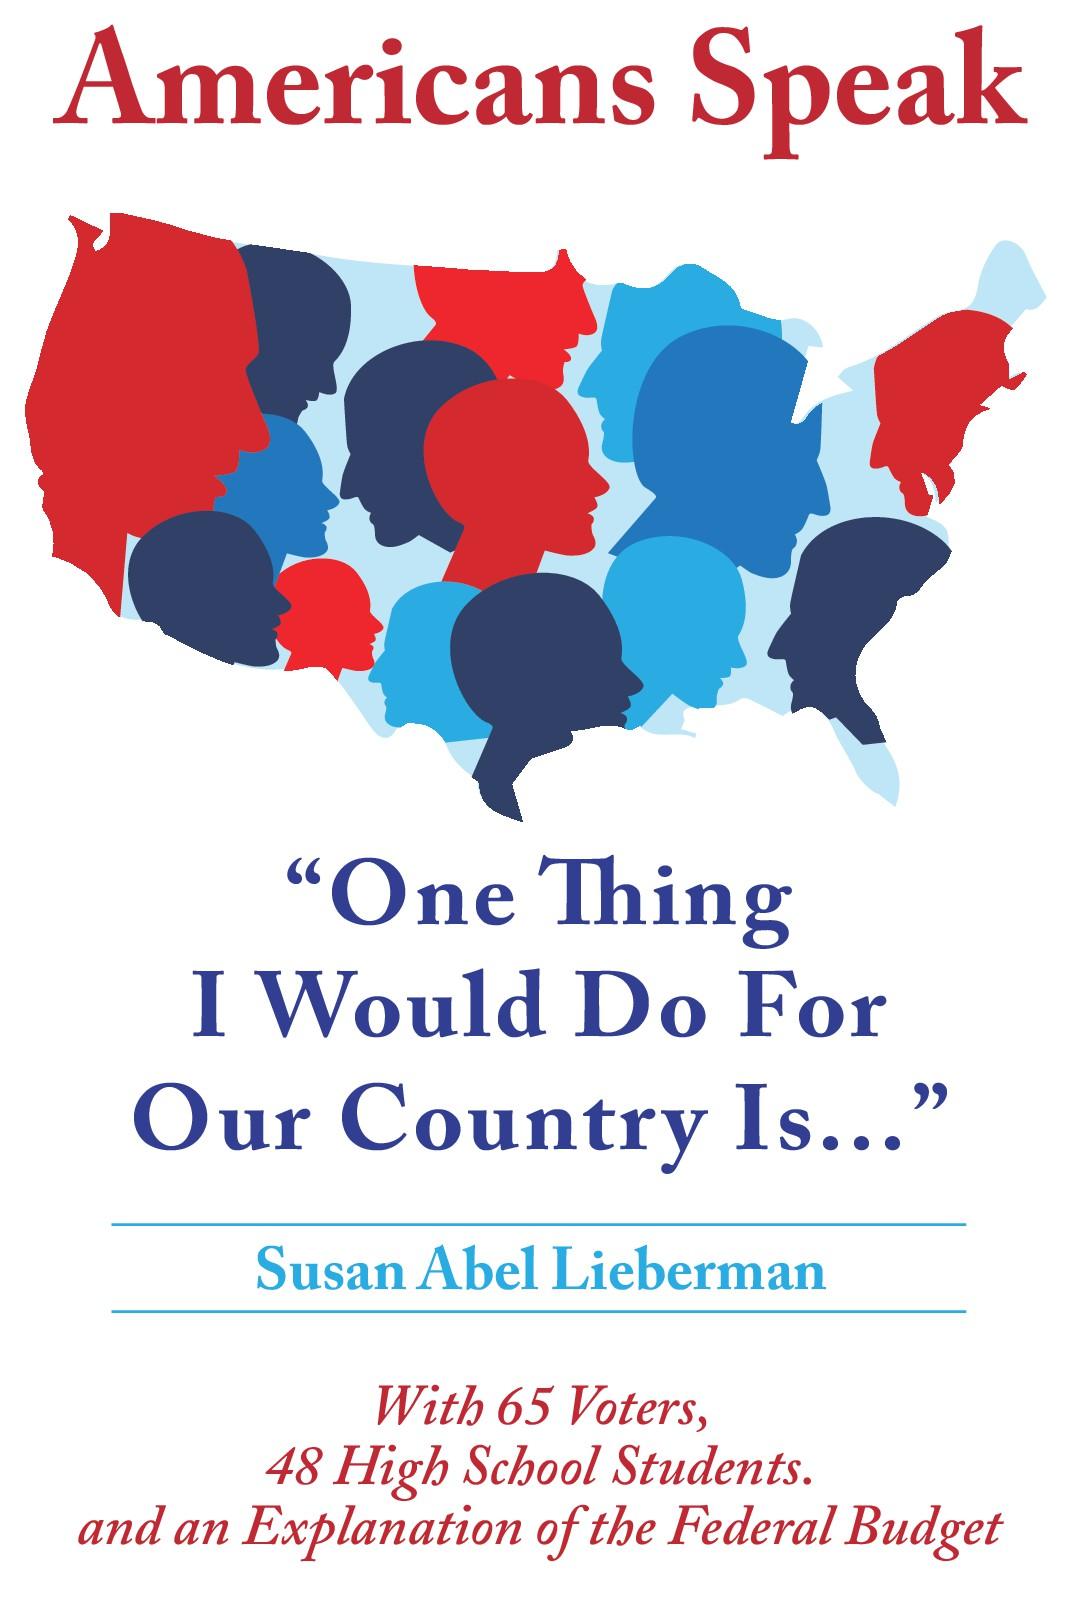 American Speak